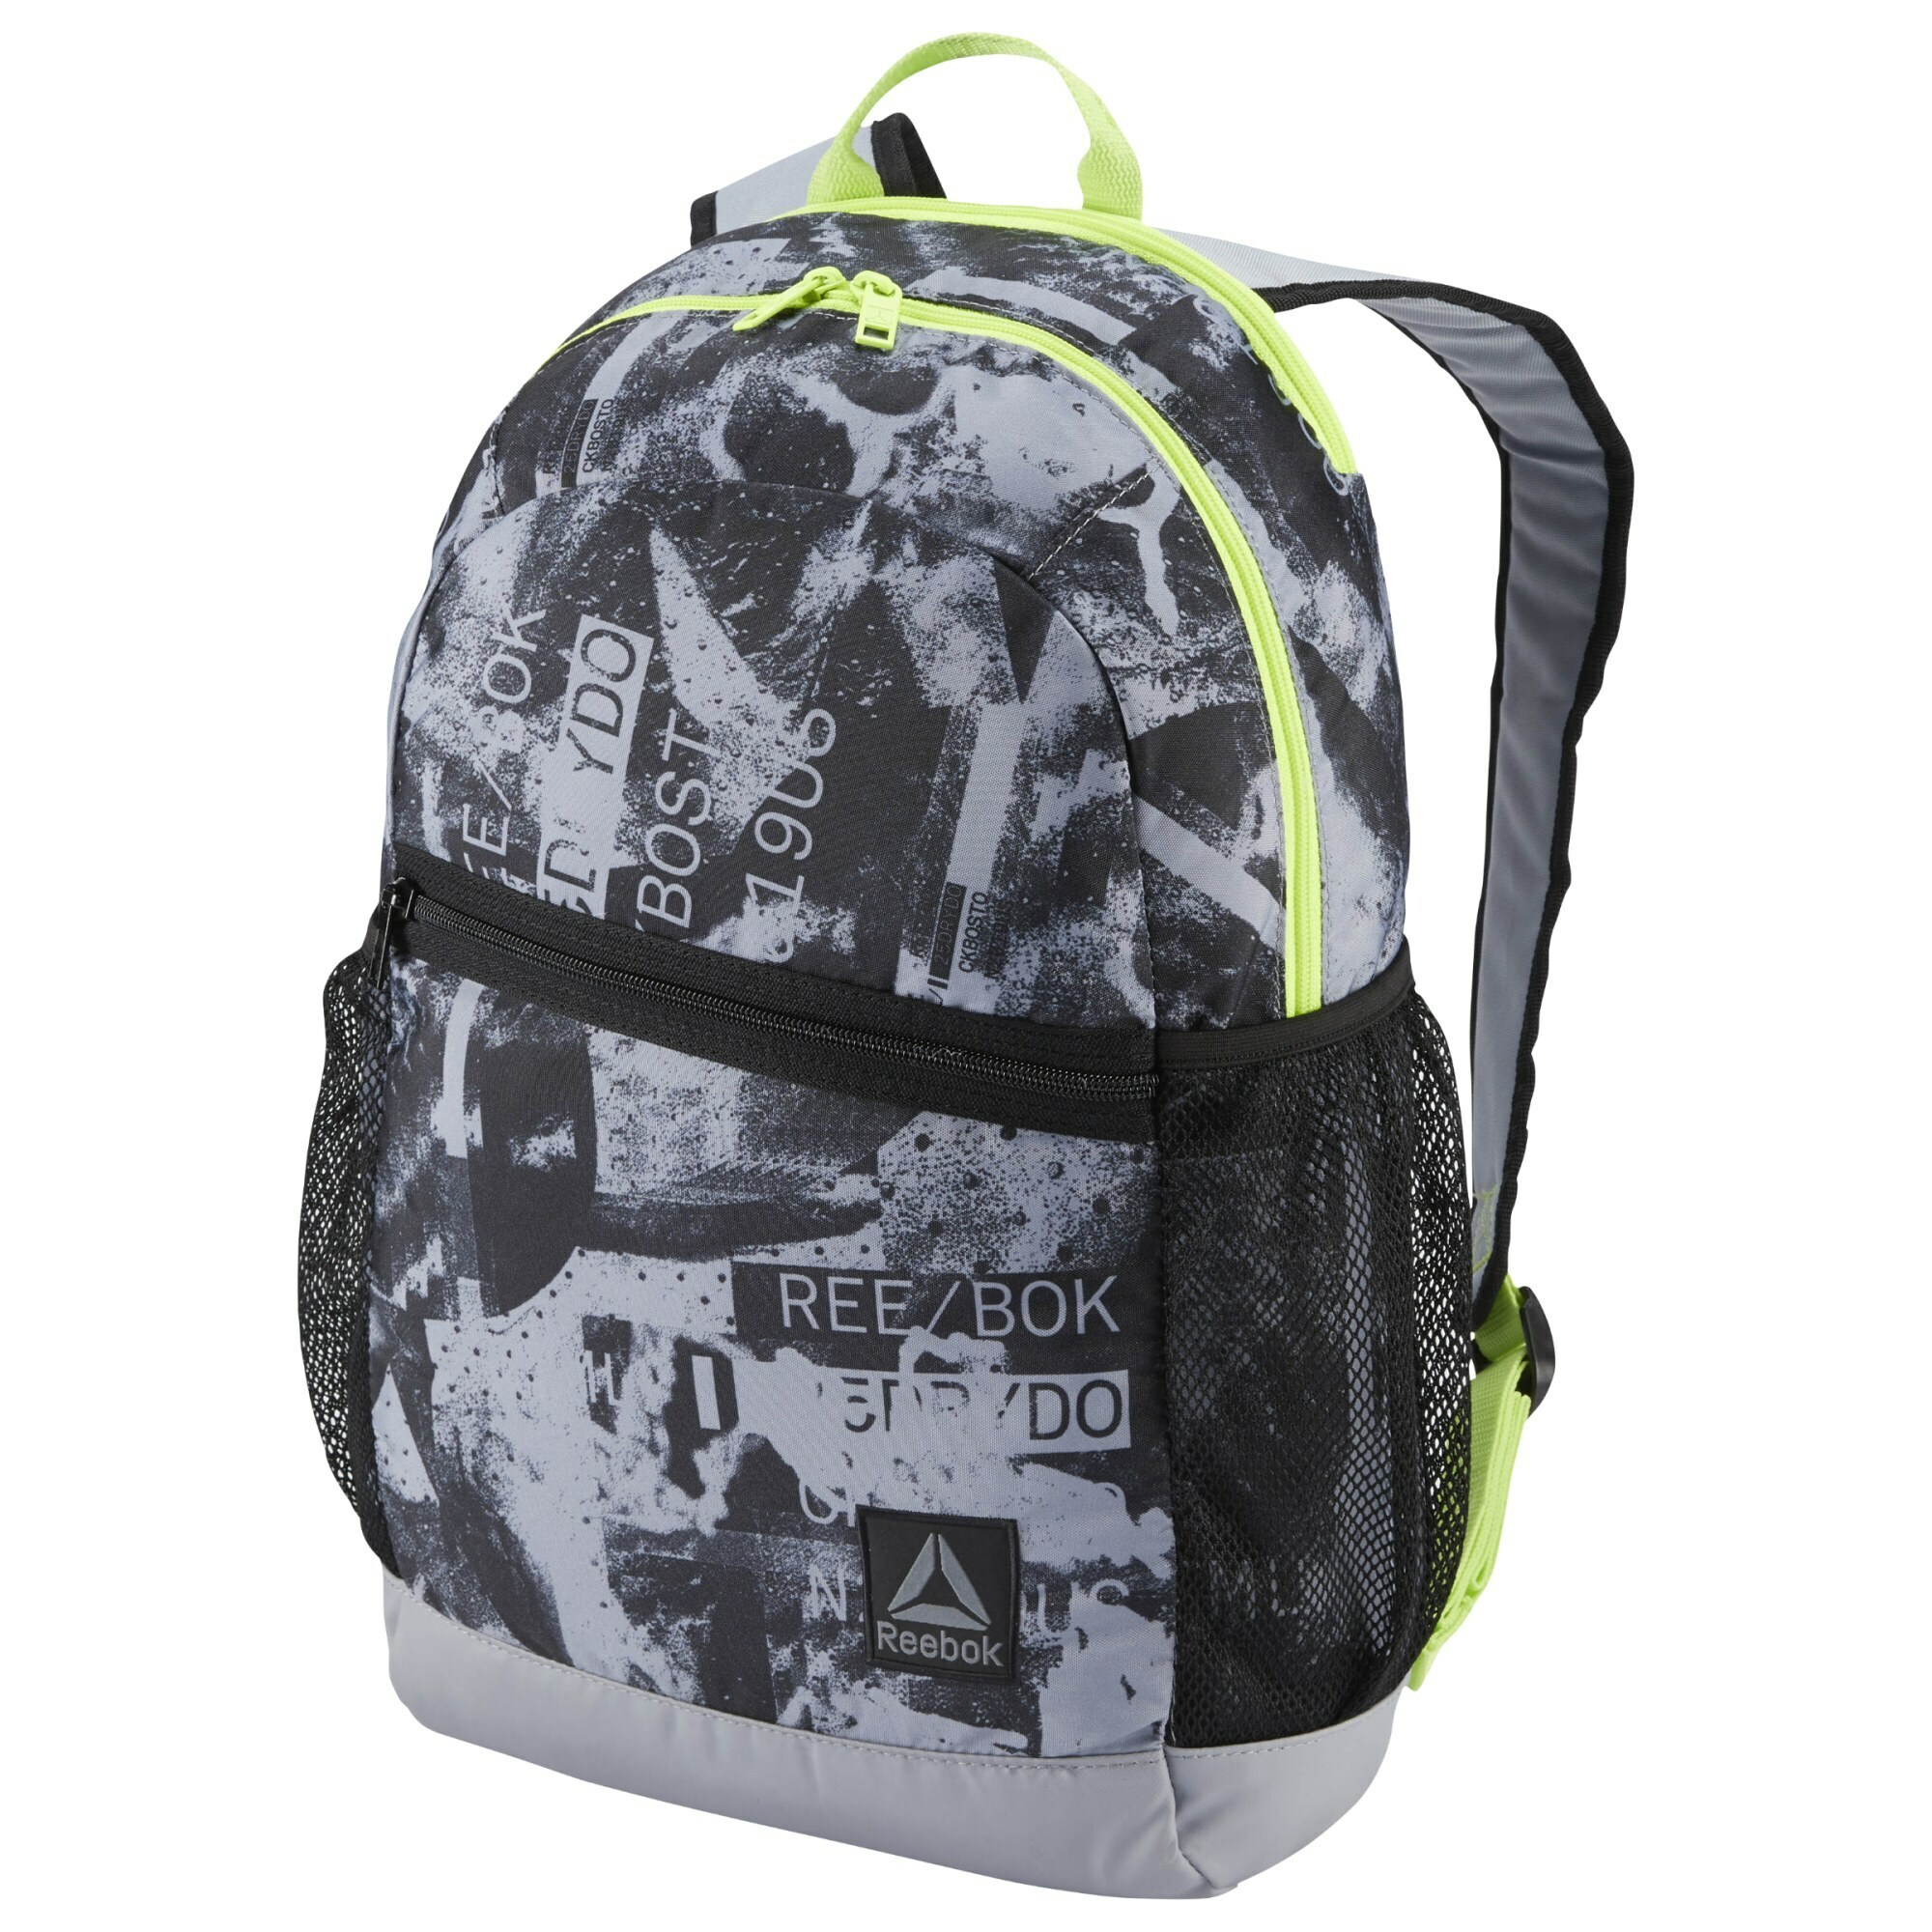 Backpack | Taschen > Rucksäcke > Tourenrucksäcke | Grau - Schwarz | Reebok